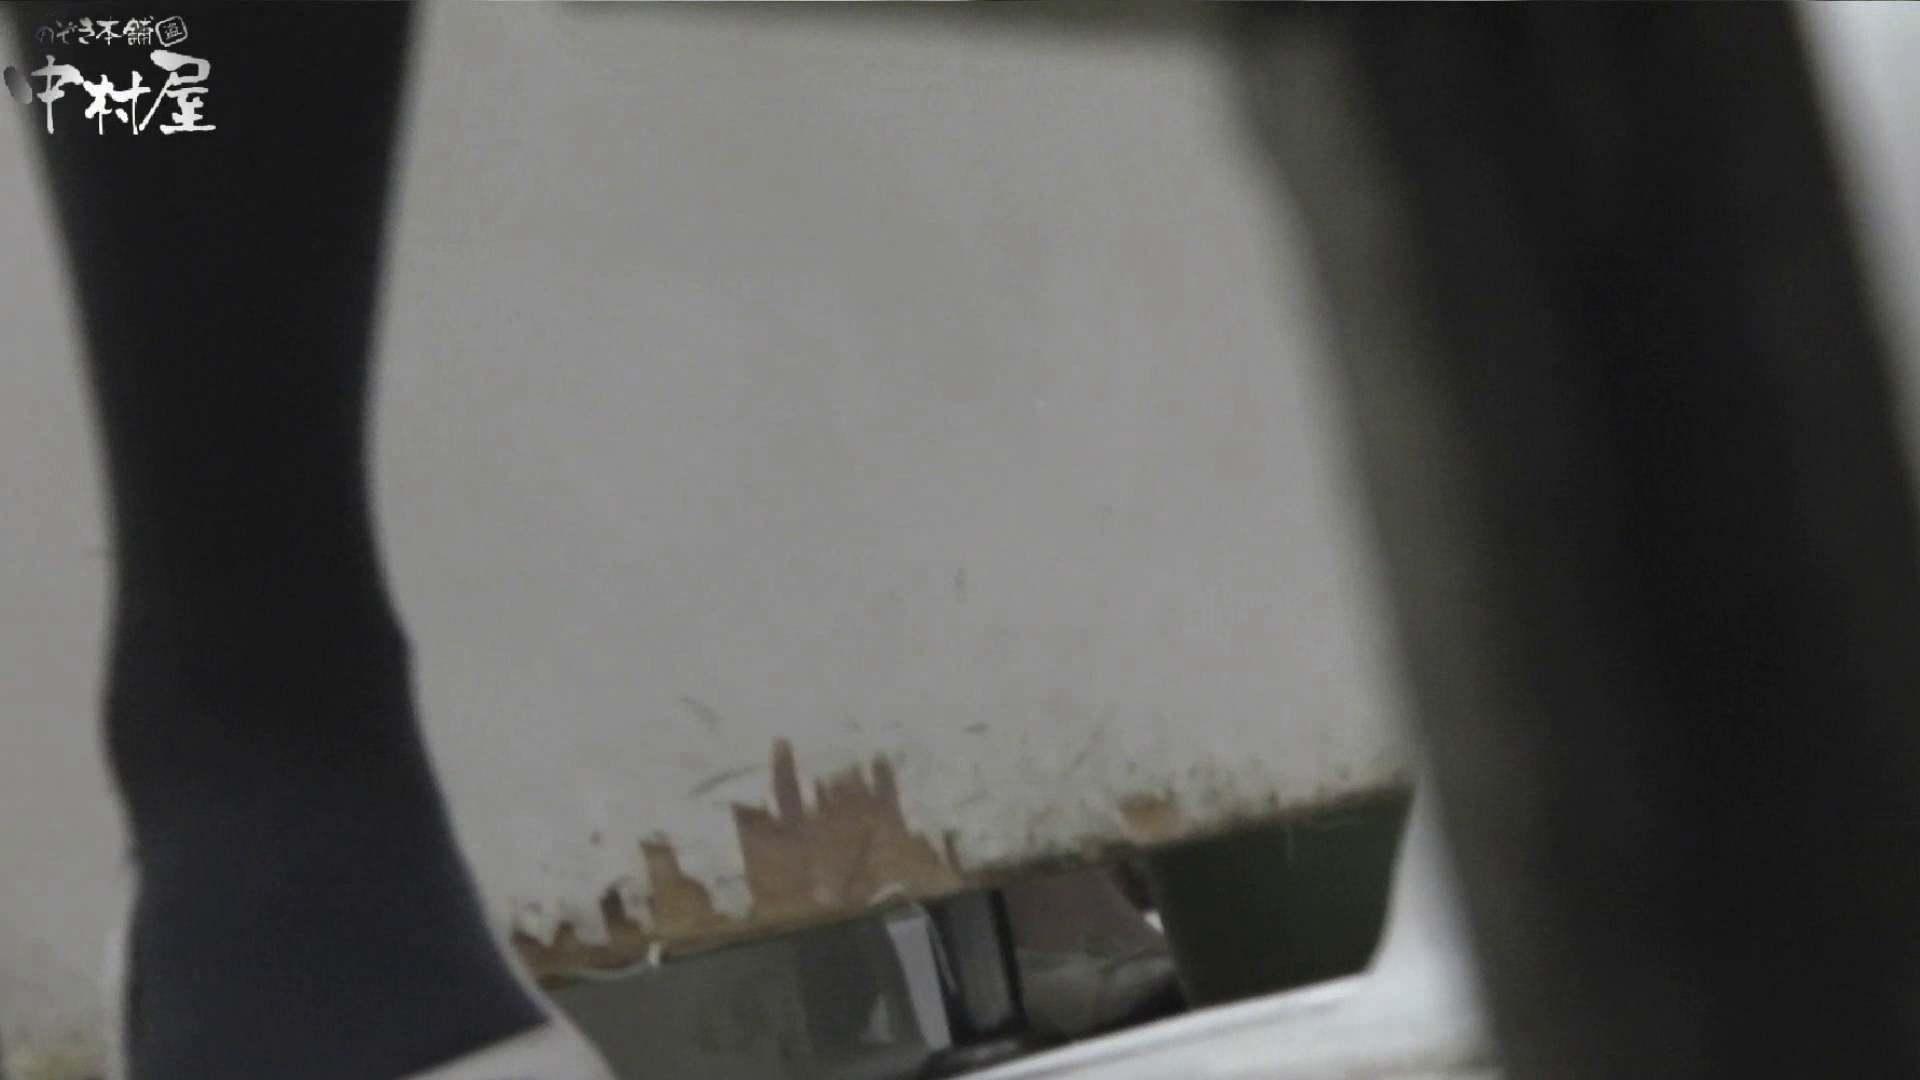 vol.41 命がけ潜伏洗面所! 毛薄め・硬度並・推定250g 美しいOLの裸体 濡れ場動画紹介 93pic 66